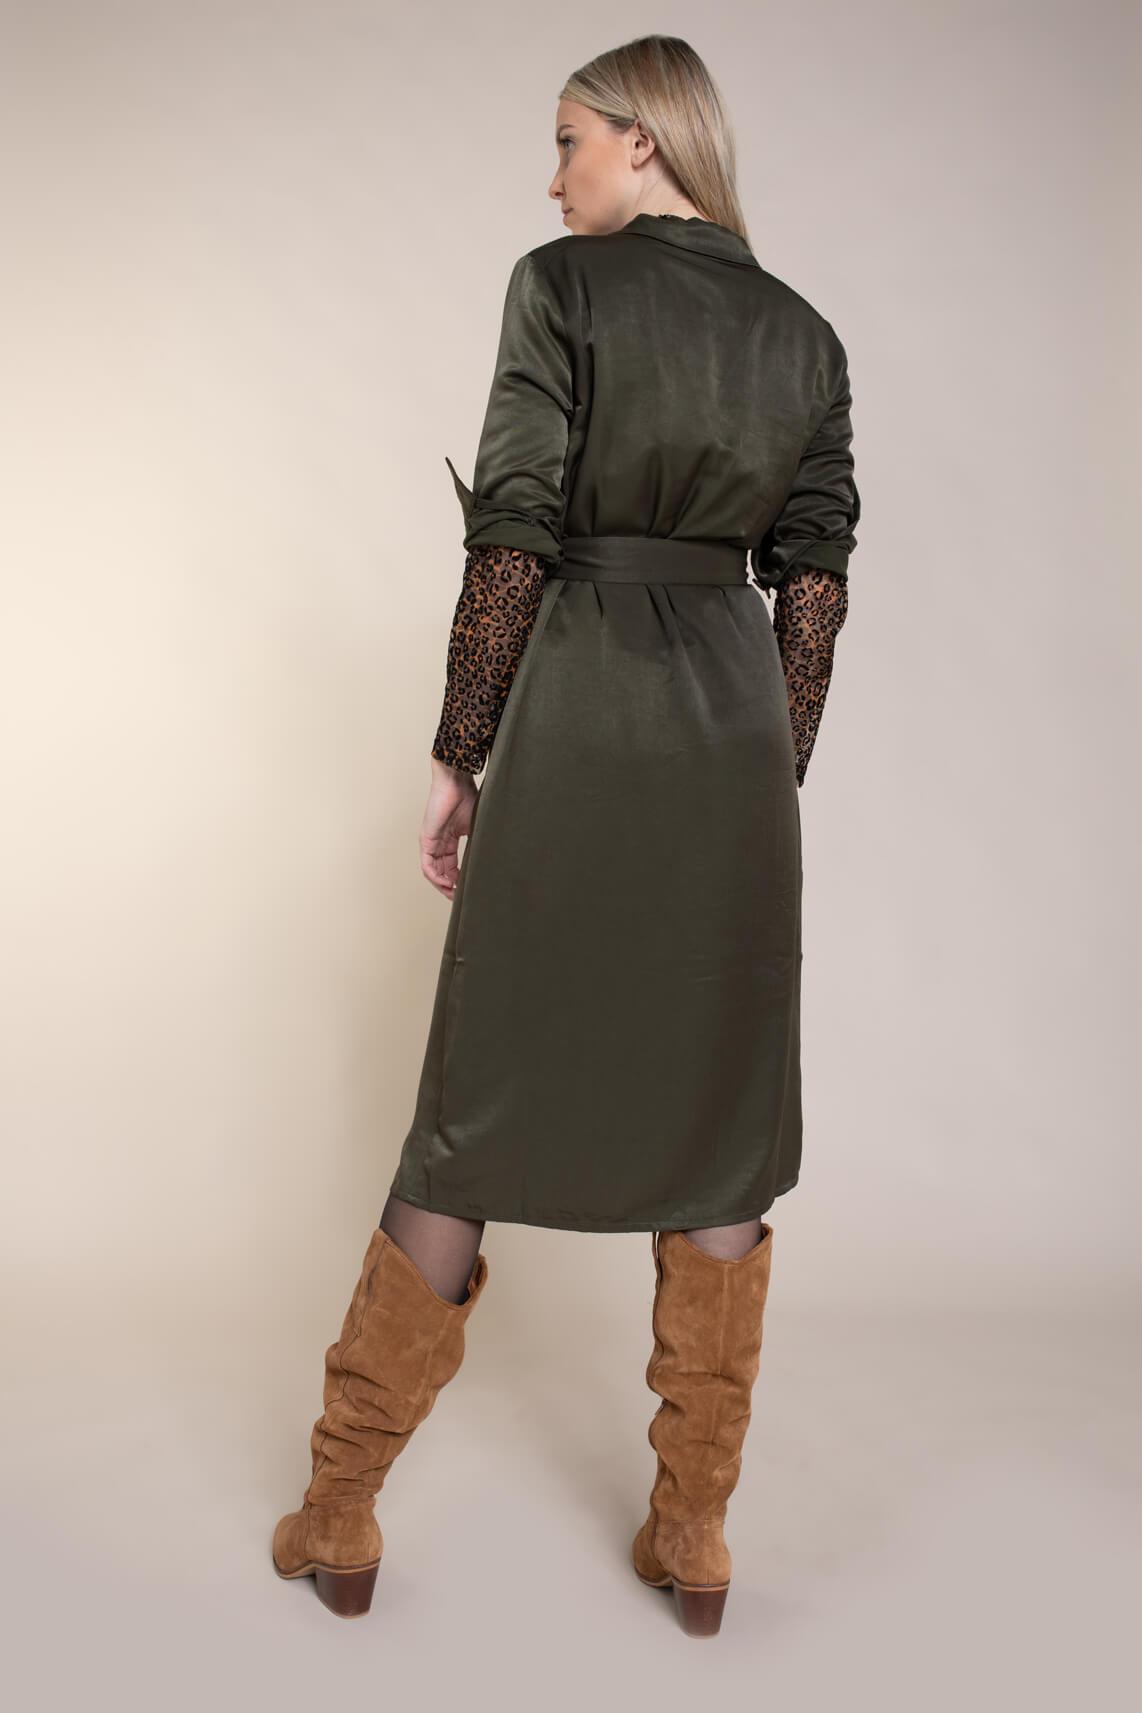 Copenhagen Muse Dames Sway jurk groen